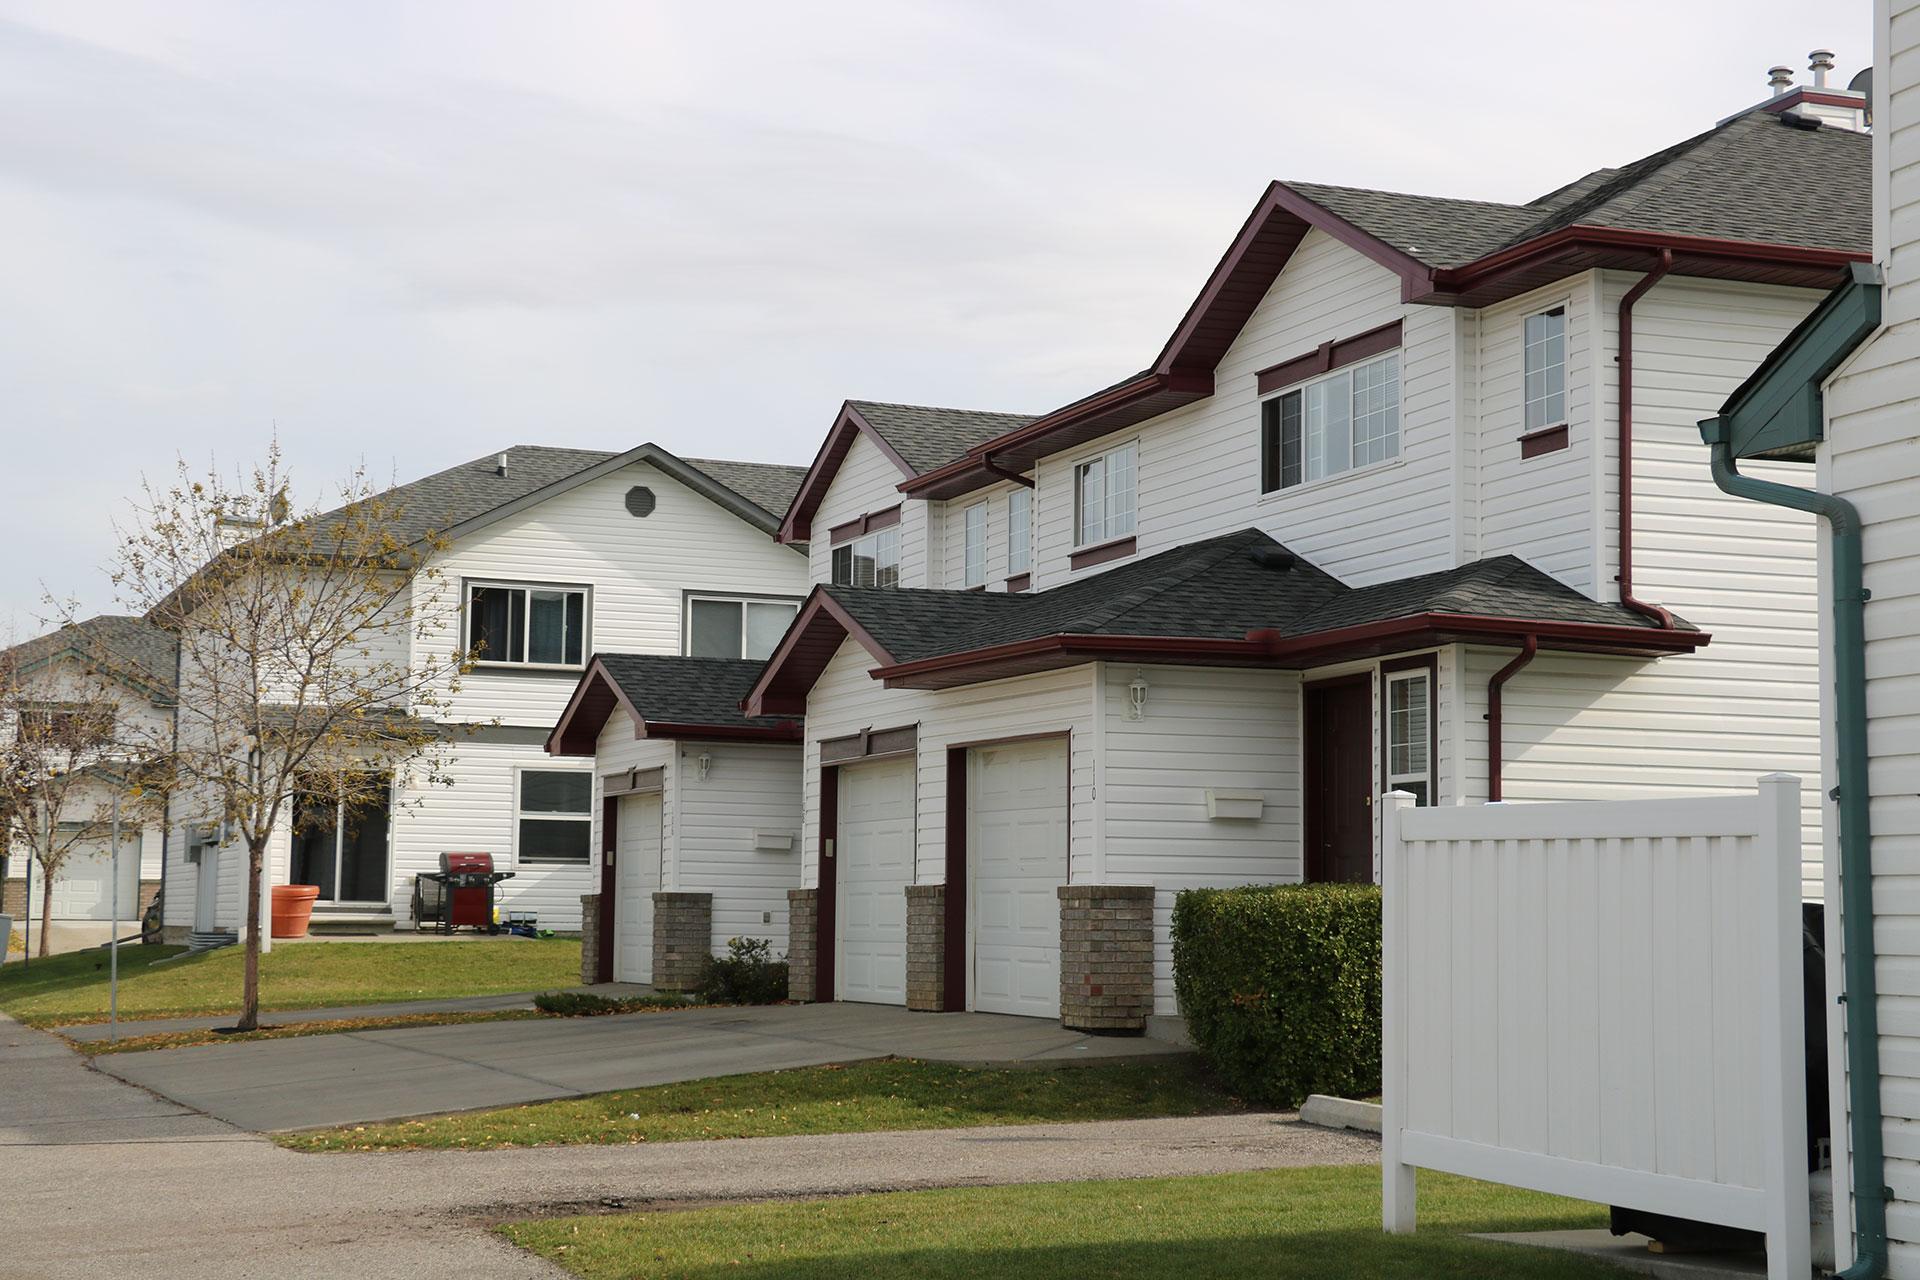 CS Management Inc. - Lakeview Greens Condominiums